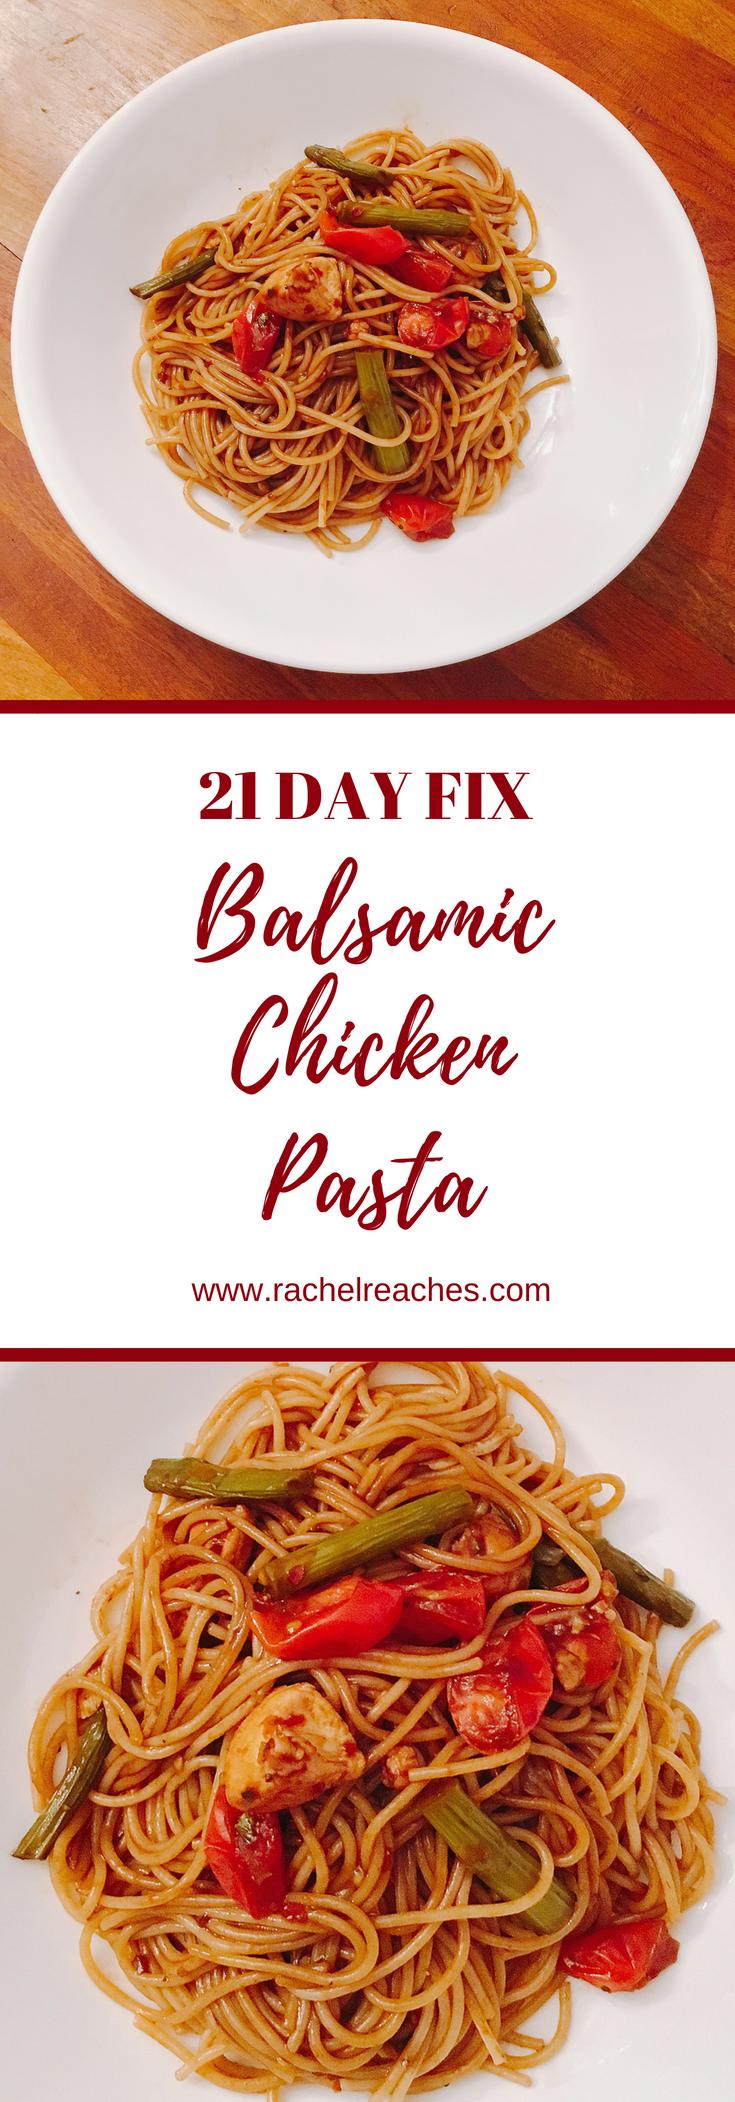 Balsamic Chicken Pasta Pinterest Pin - 21 Day Fix.png